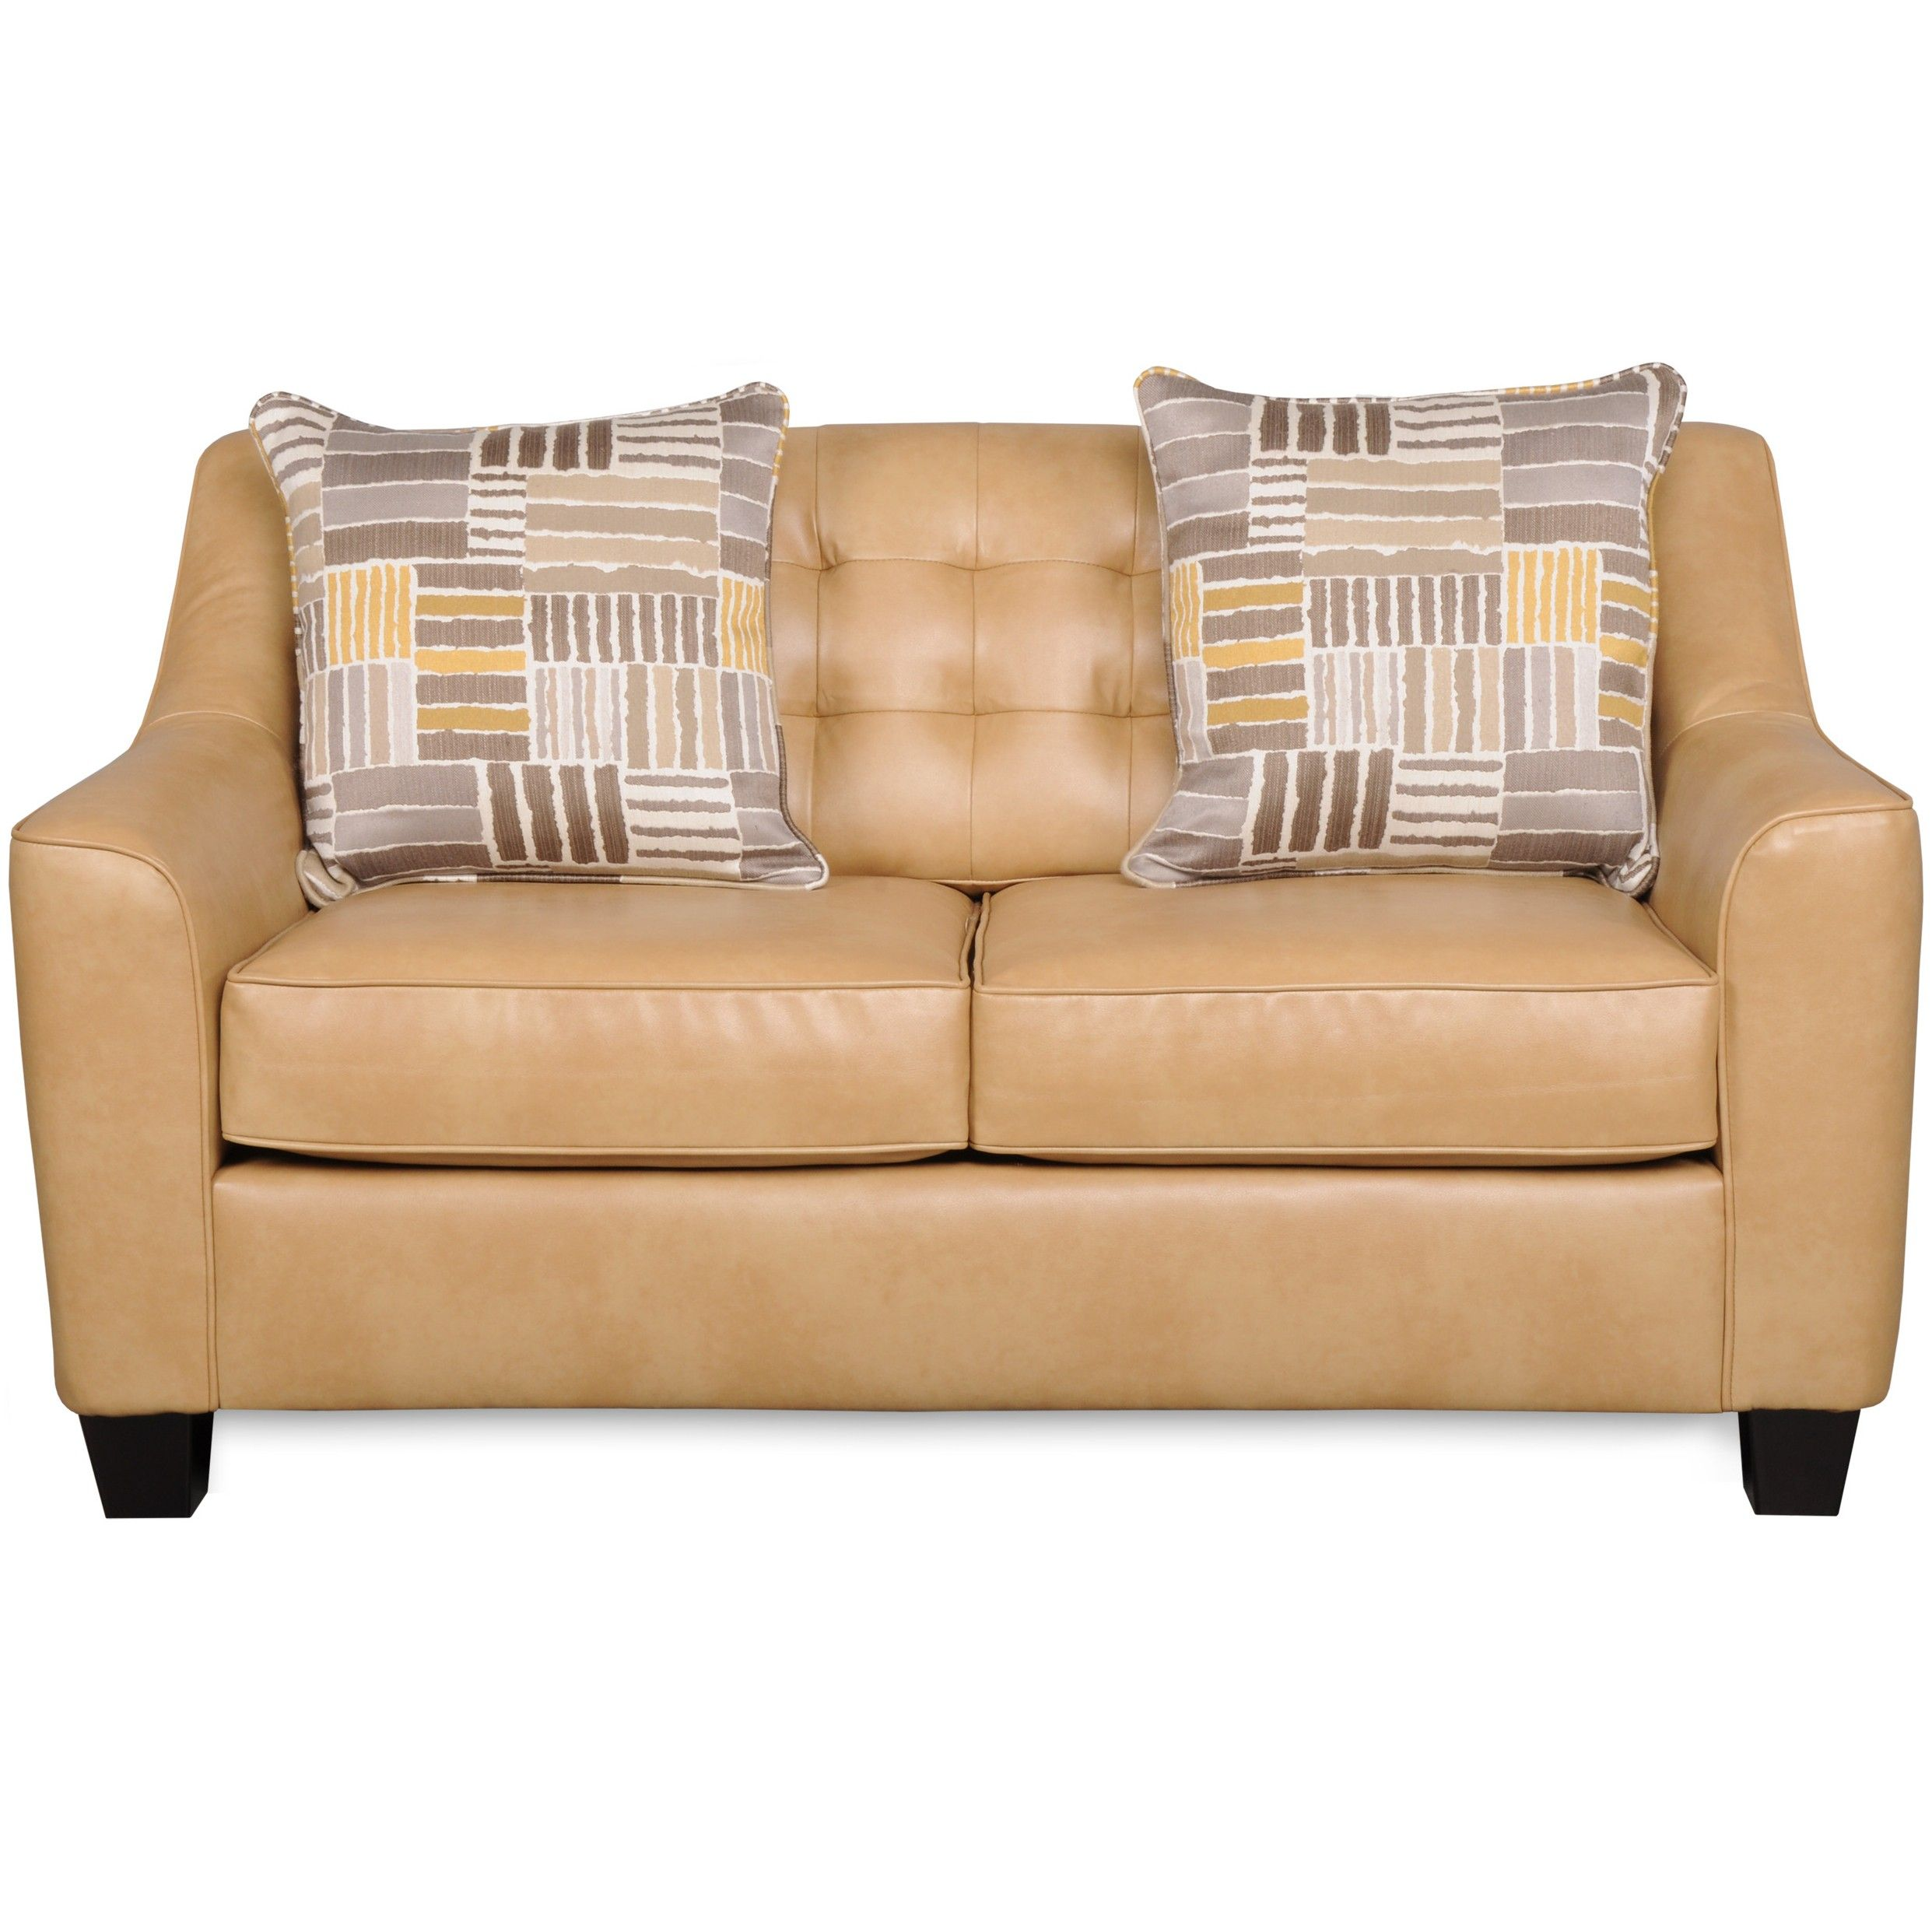 Living Room Furniture Modern Light Brown Leather Love Seat